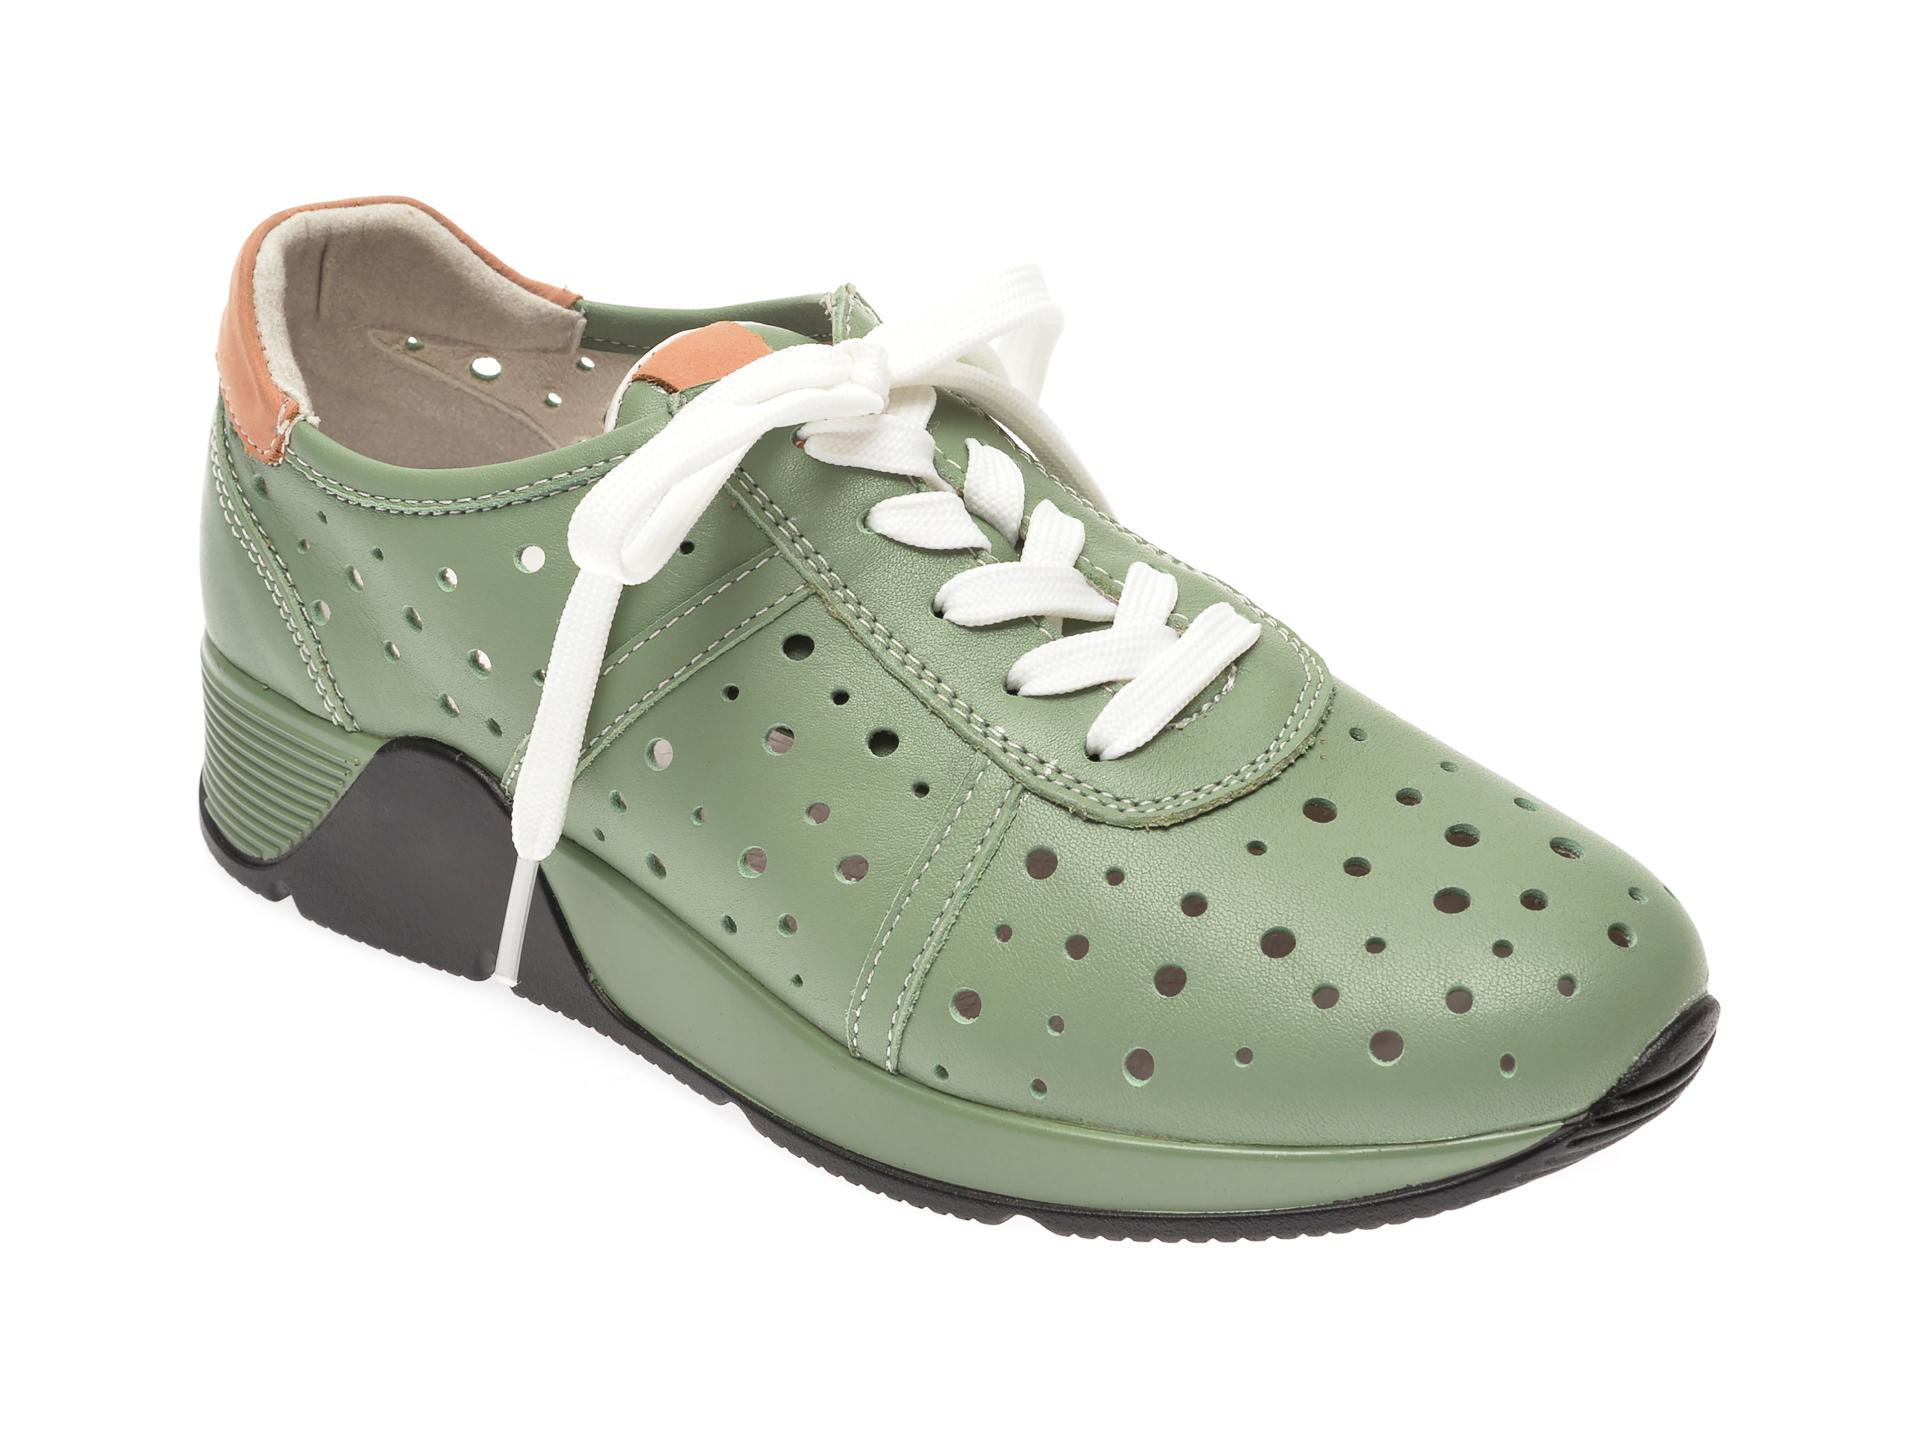 Pantofi IMAGE verzi, 8595395, din piele naturala